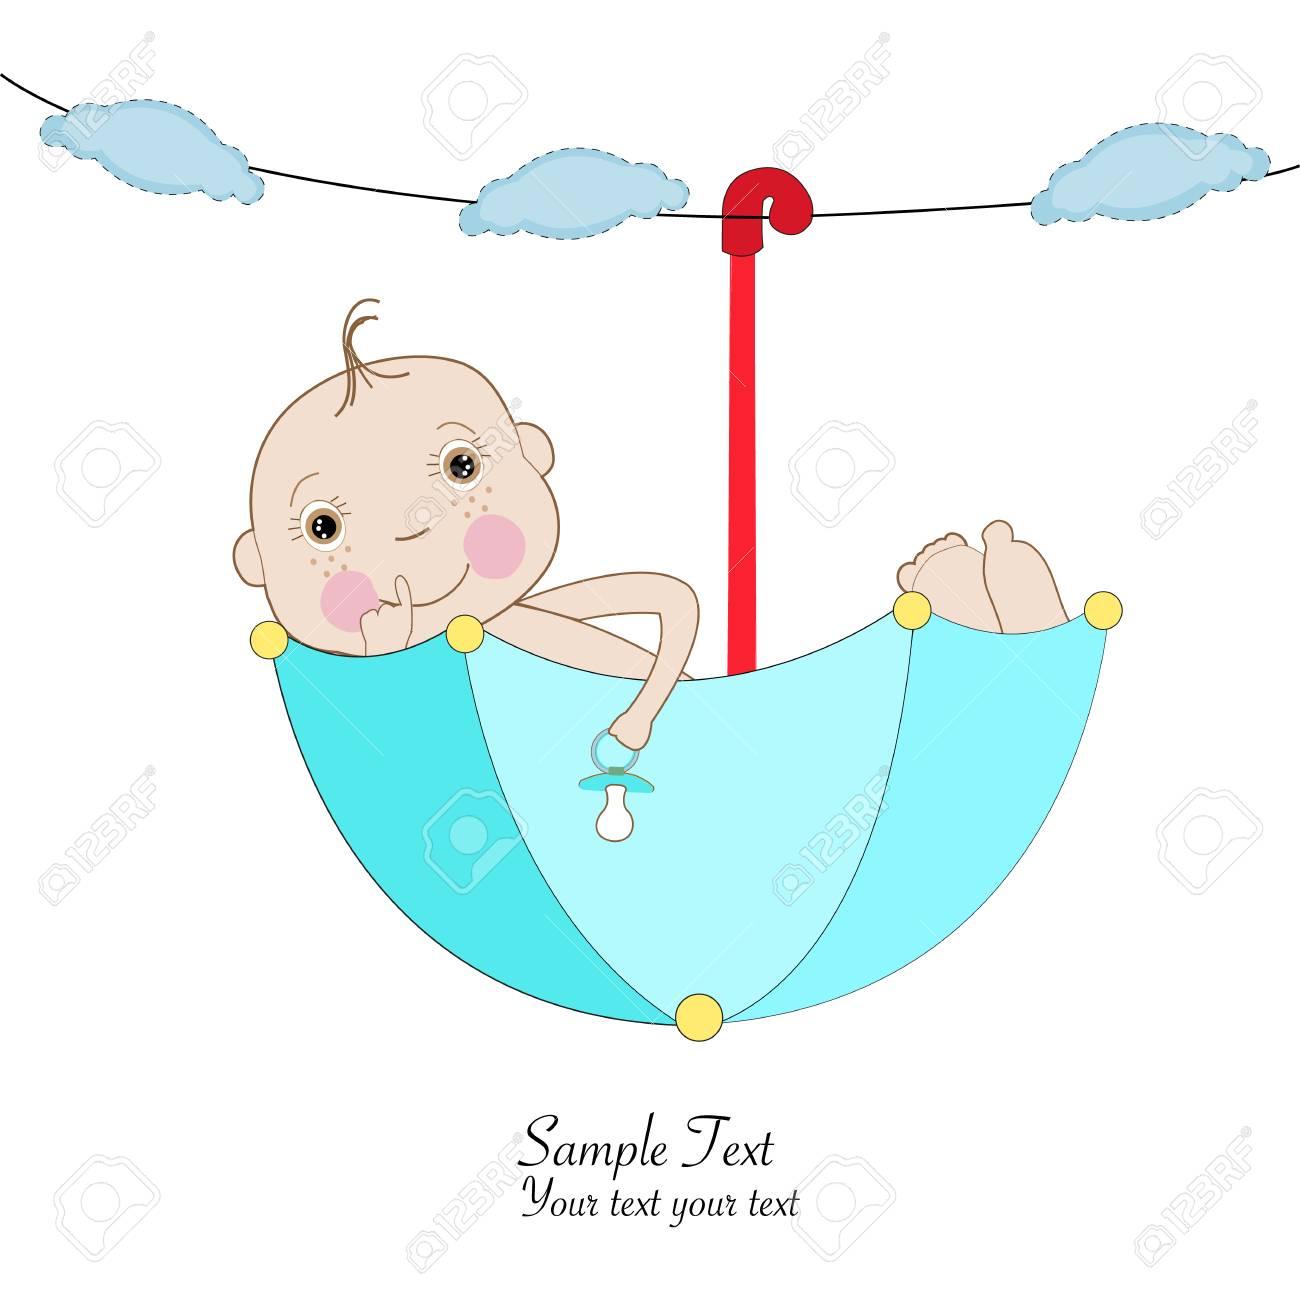 Baby boy greeting card umbrella greeting card royalty free cliparts baby boy greeting card umbrella greeting card stock vector 38576181 m4hsunfo